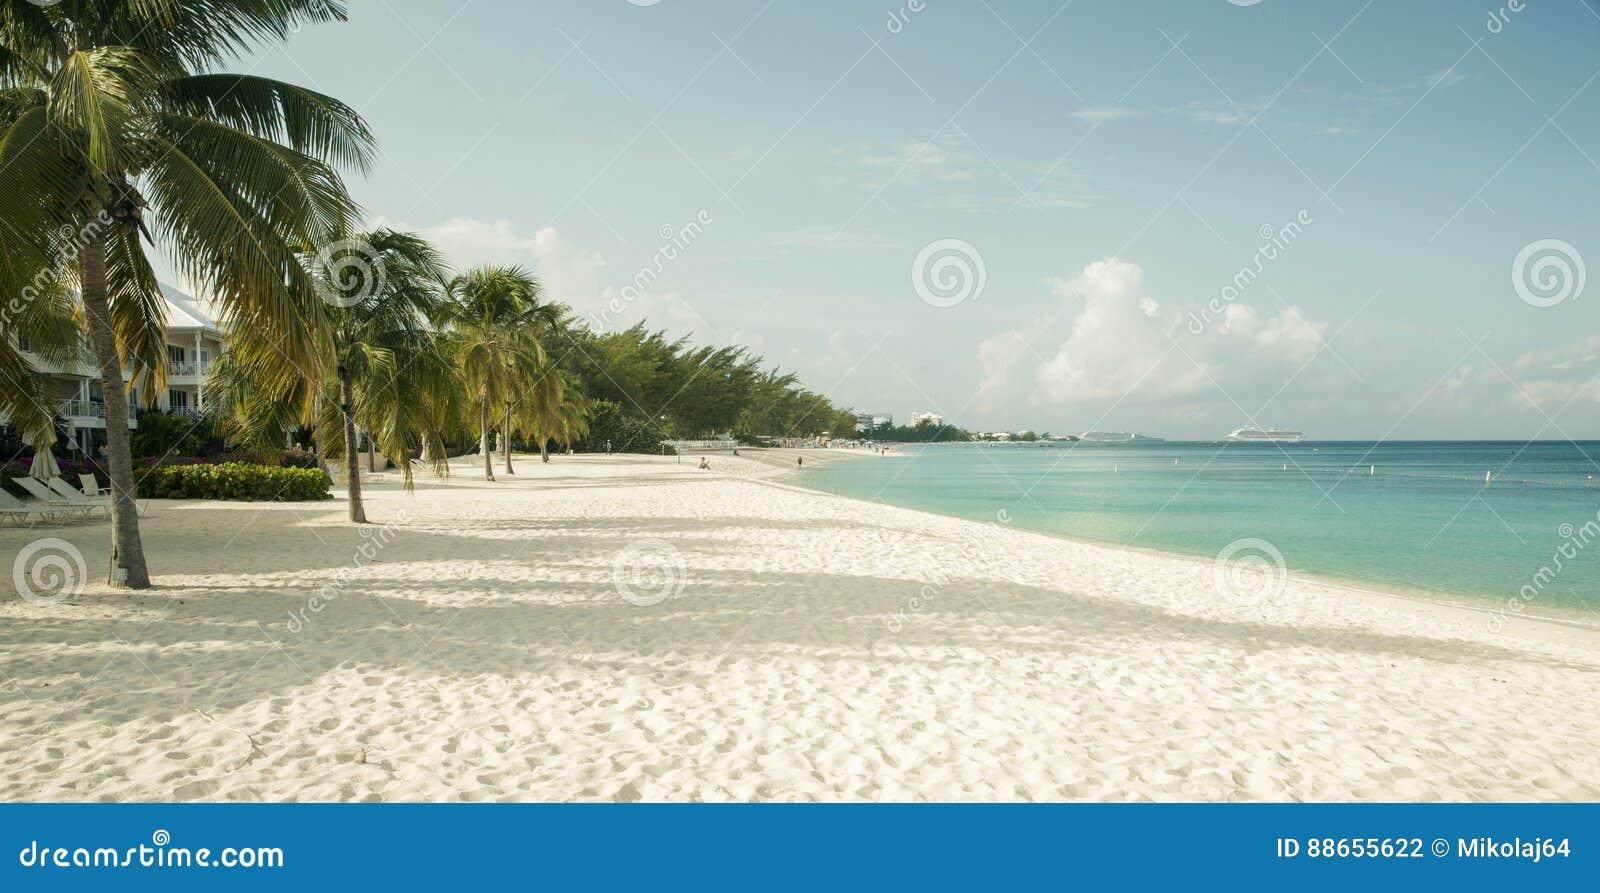 Seven Mile Beach on Grand Cayman island, Cayman Islands